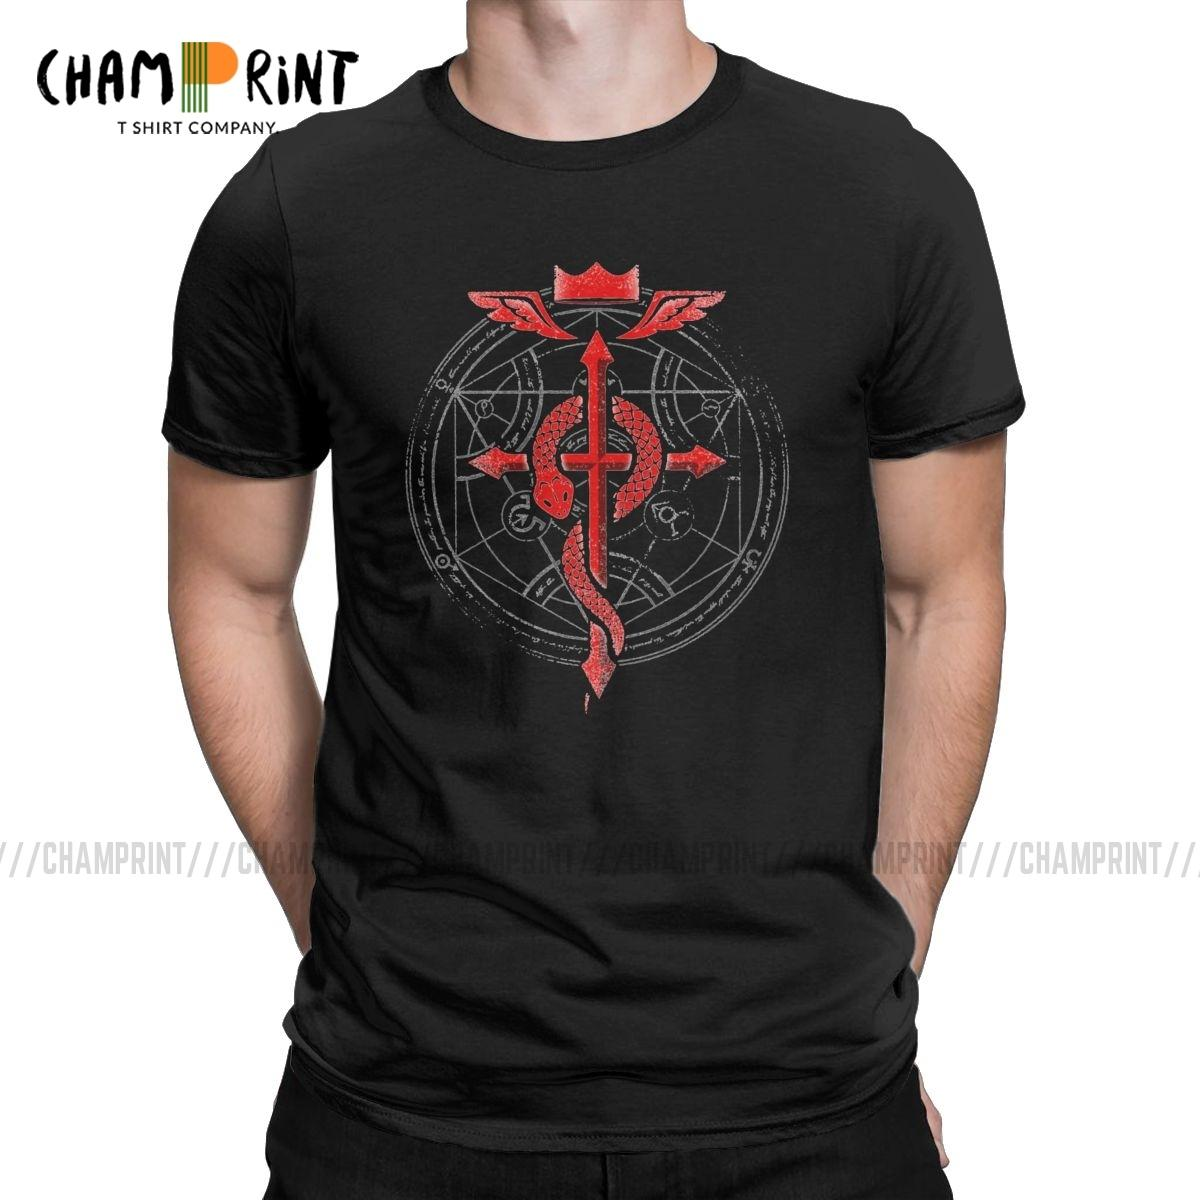 Fullmetal Alchemist T-Shirts für Männer Bruderschaft Stolz Anime Elric Edward lustigen T-Shirt O-Hals-T-Shirt Geschenk-Idee Tops